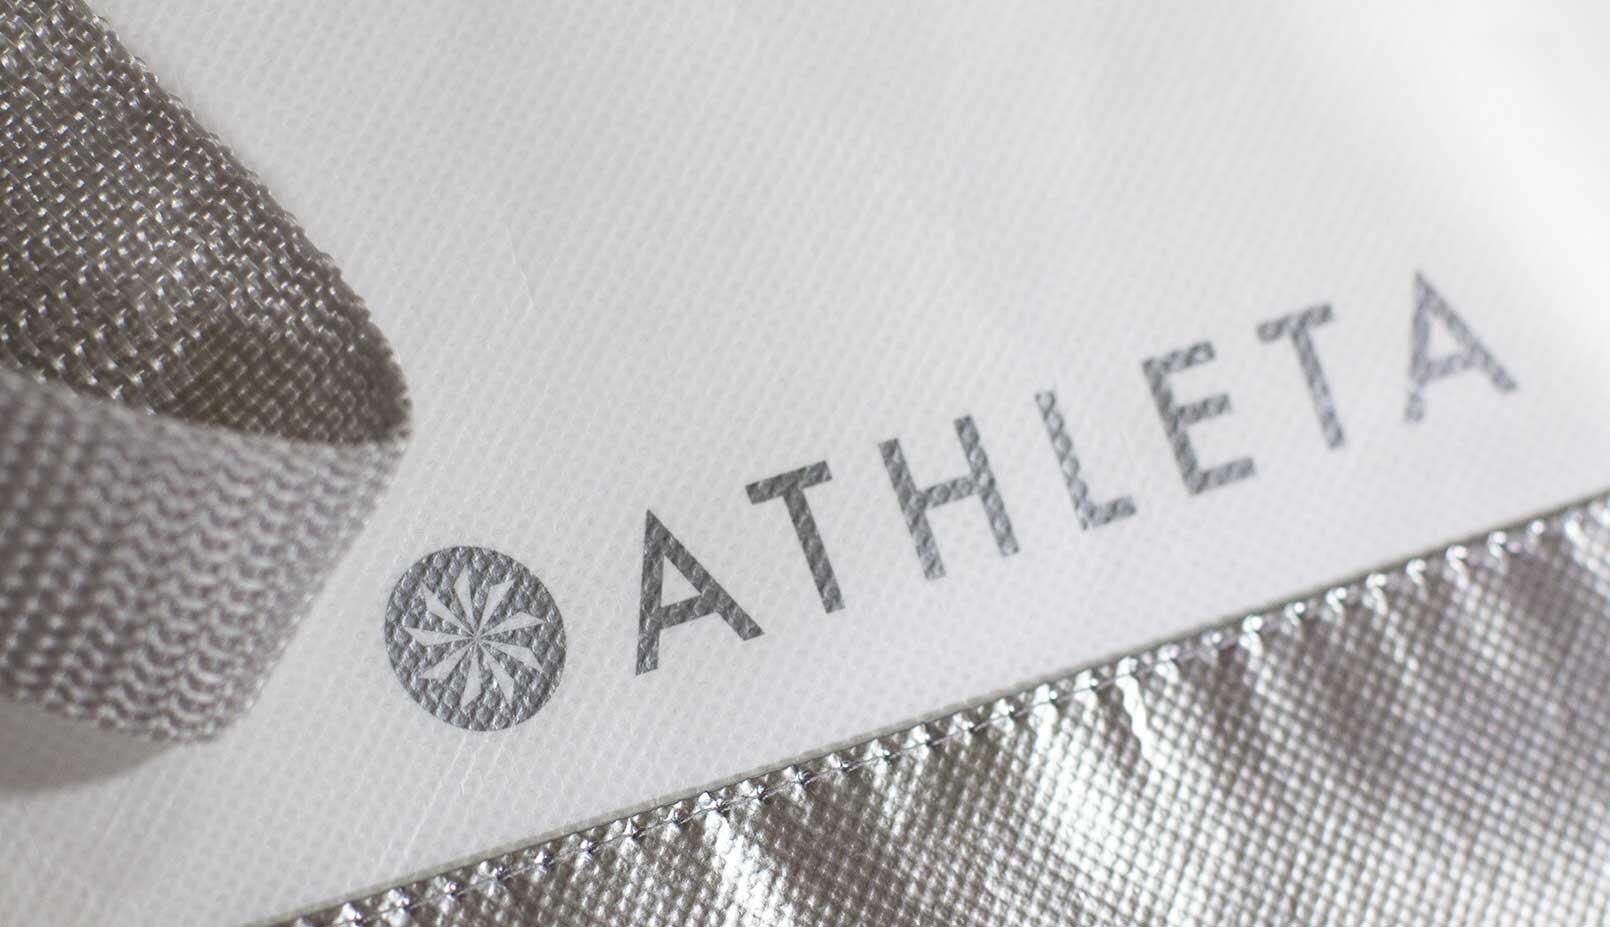 Athleta-Bag-Tote-Design-Packaging-Company-2.JPG